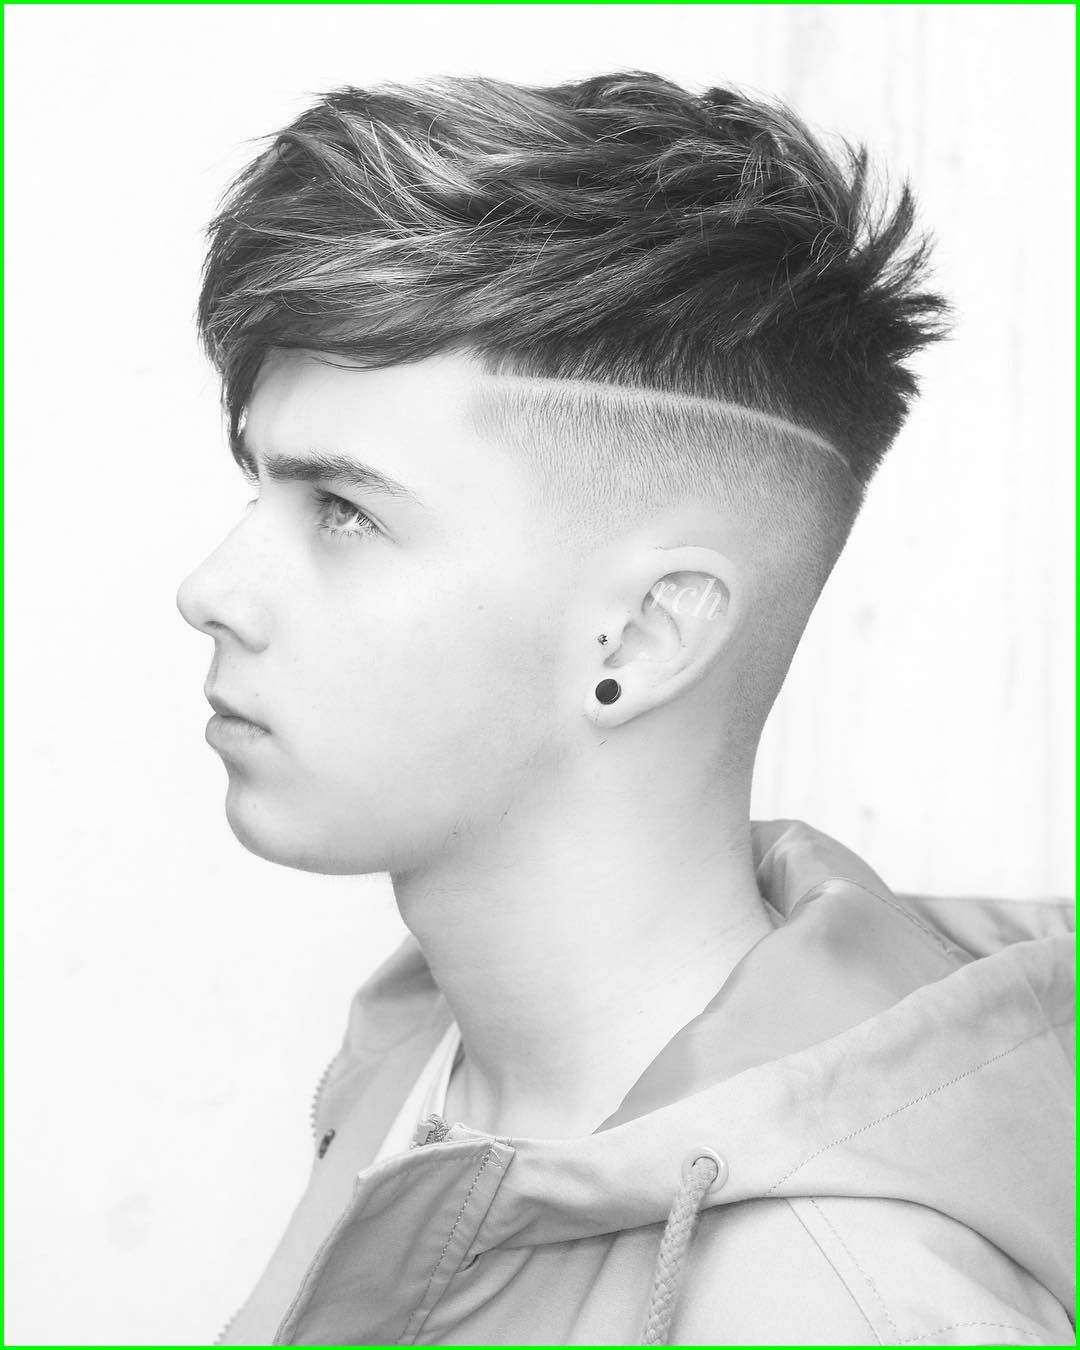 How Much To Tip Mens Haircut 2117 Ryancullenhair Long Hair On Top Short Sides Mens Haircut Long Hair Styles Men Long Hair On Top Long Hair Styles